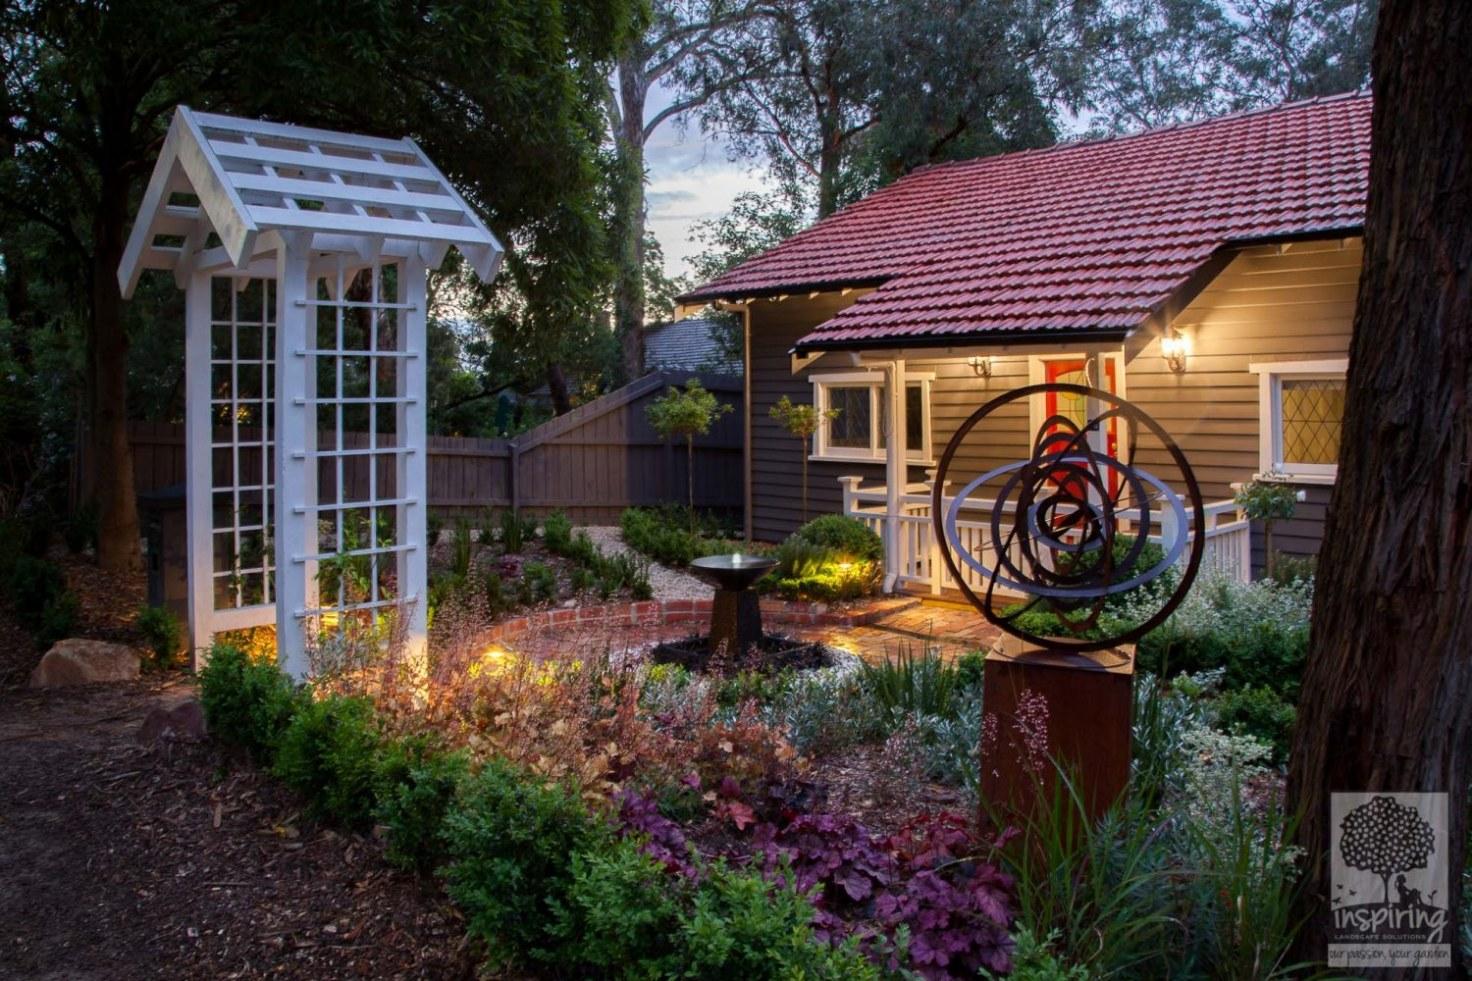 Blackburn front garden design lit up at night